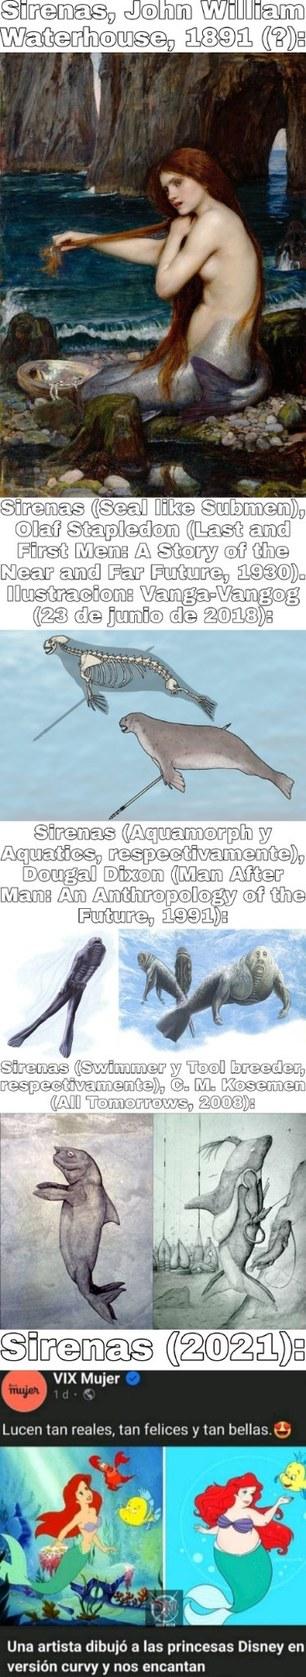 Sirenas 2021 - meme